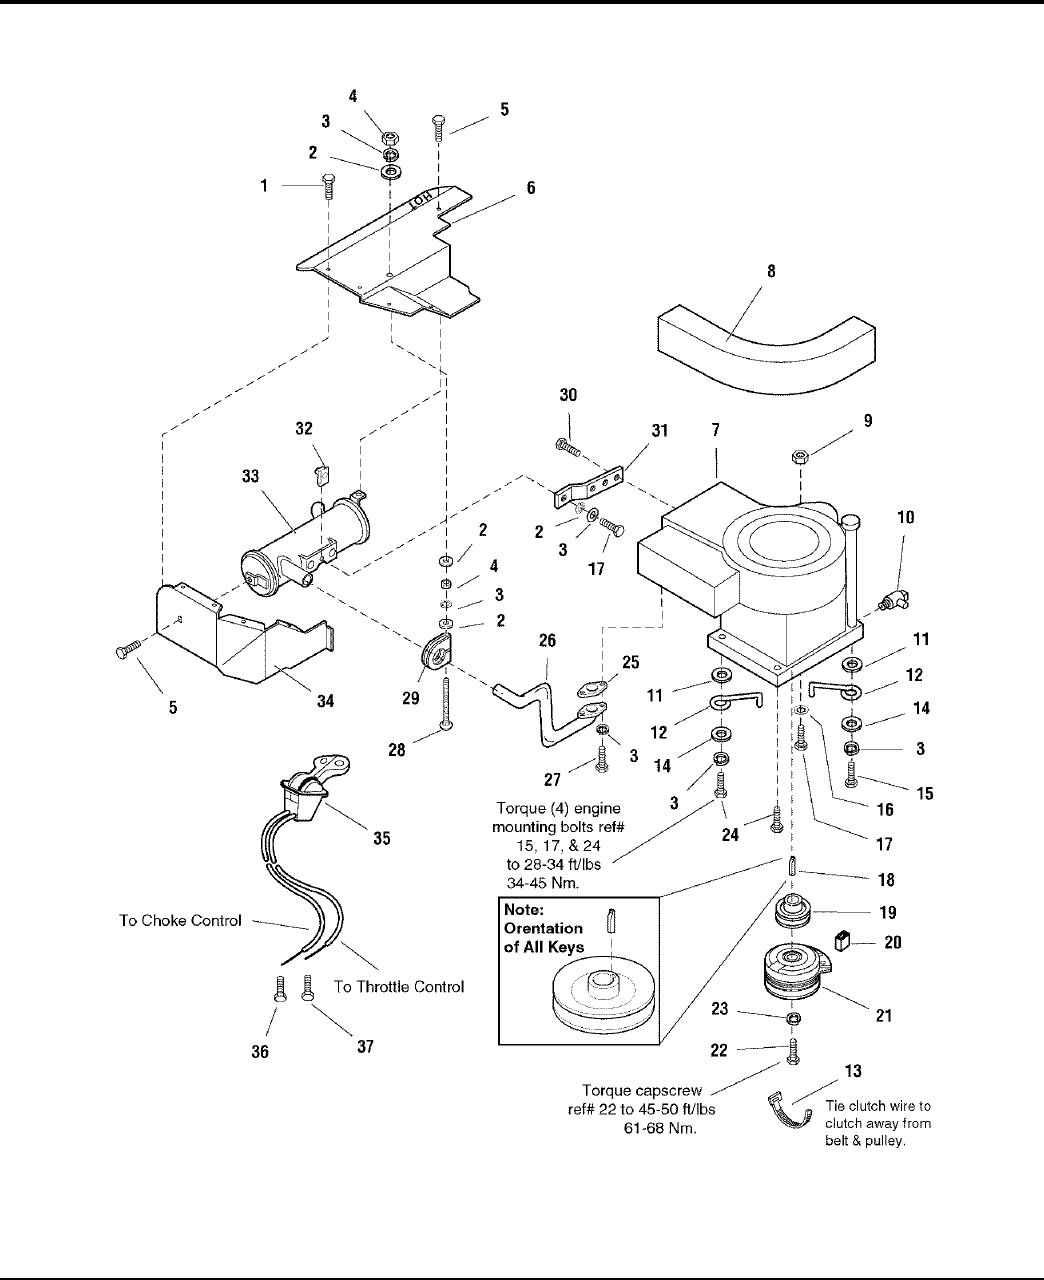 Simplicity 400 Series Parts Manual Coronet / 2400